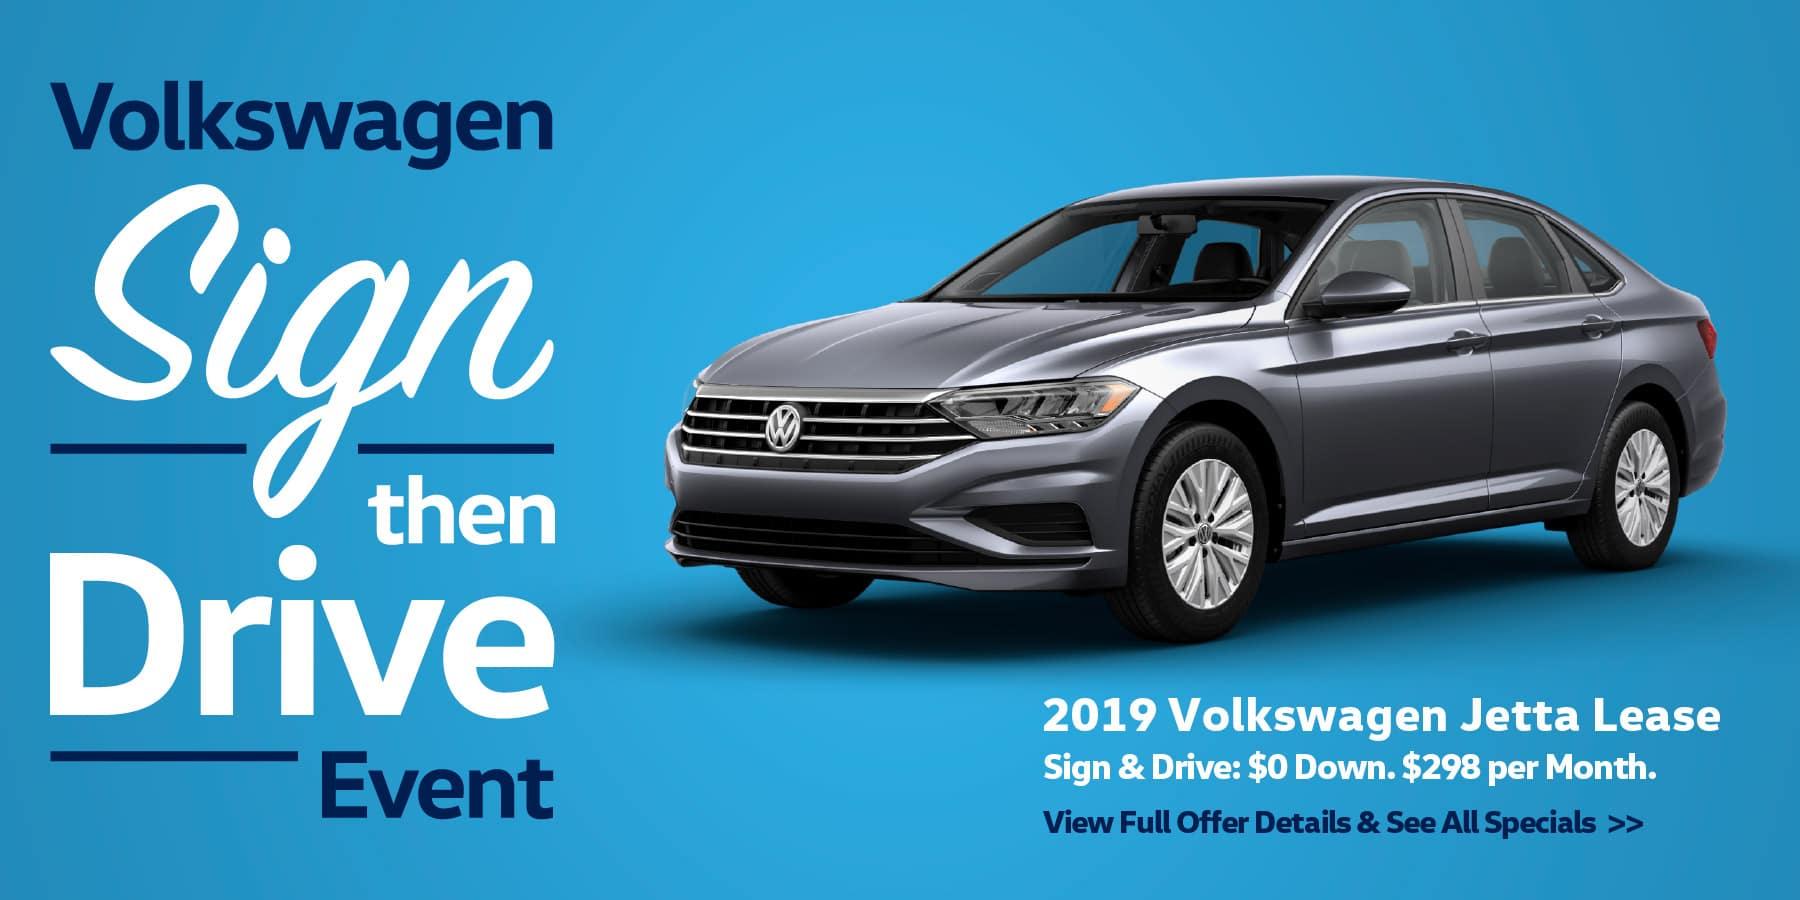 Autobahn Volkswagen | November Sign & Drive Event!